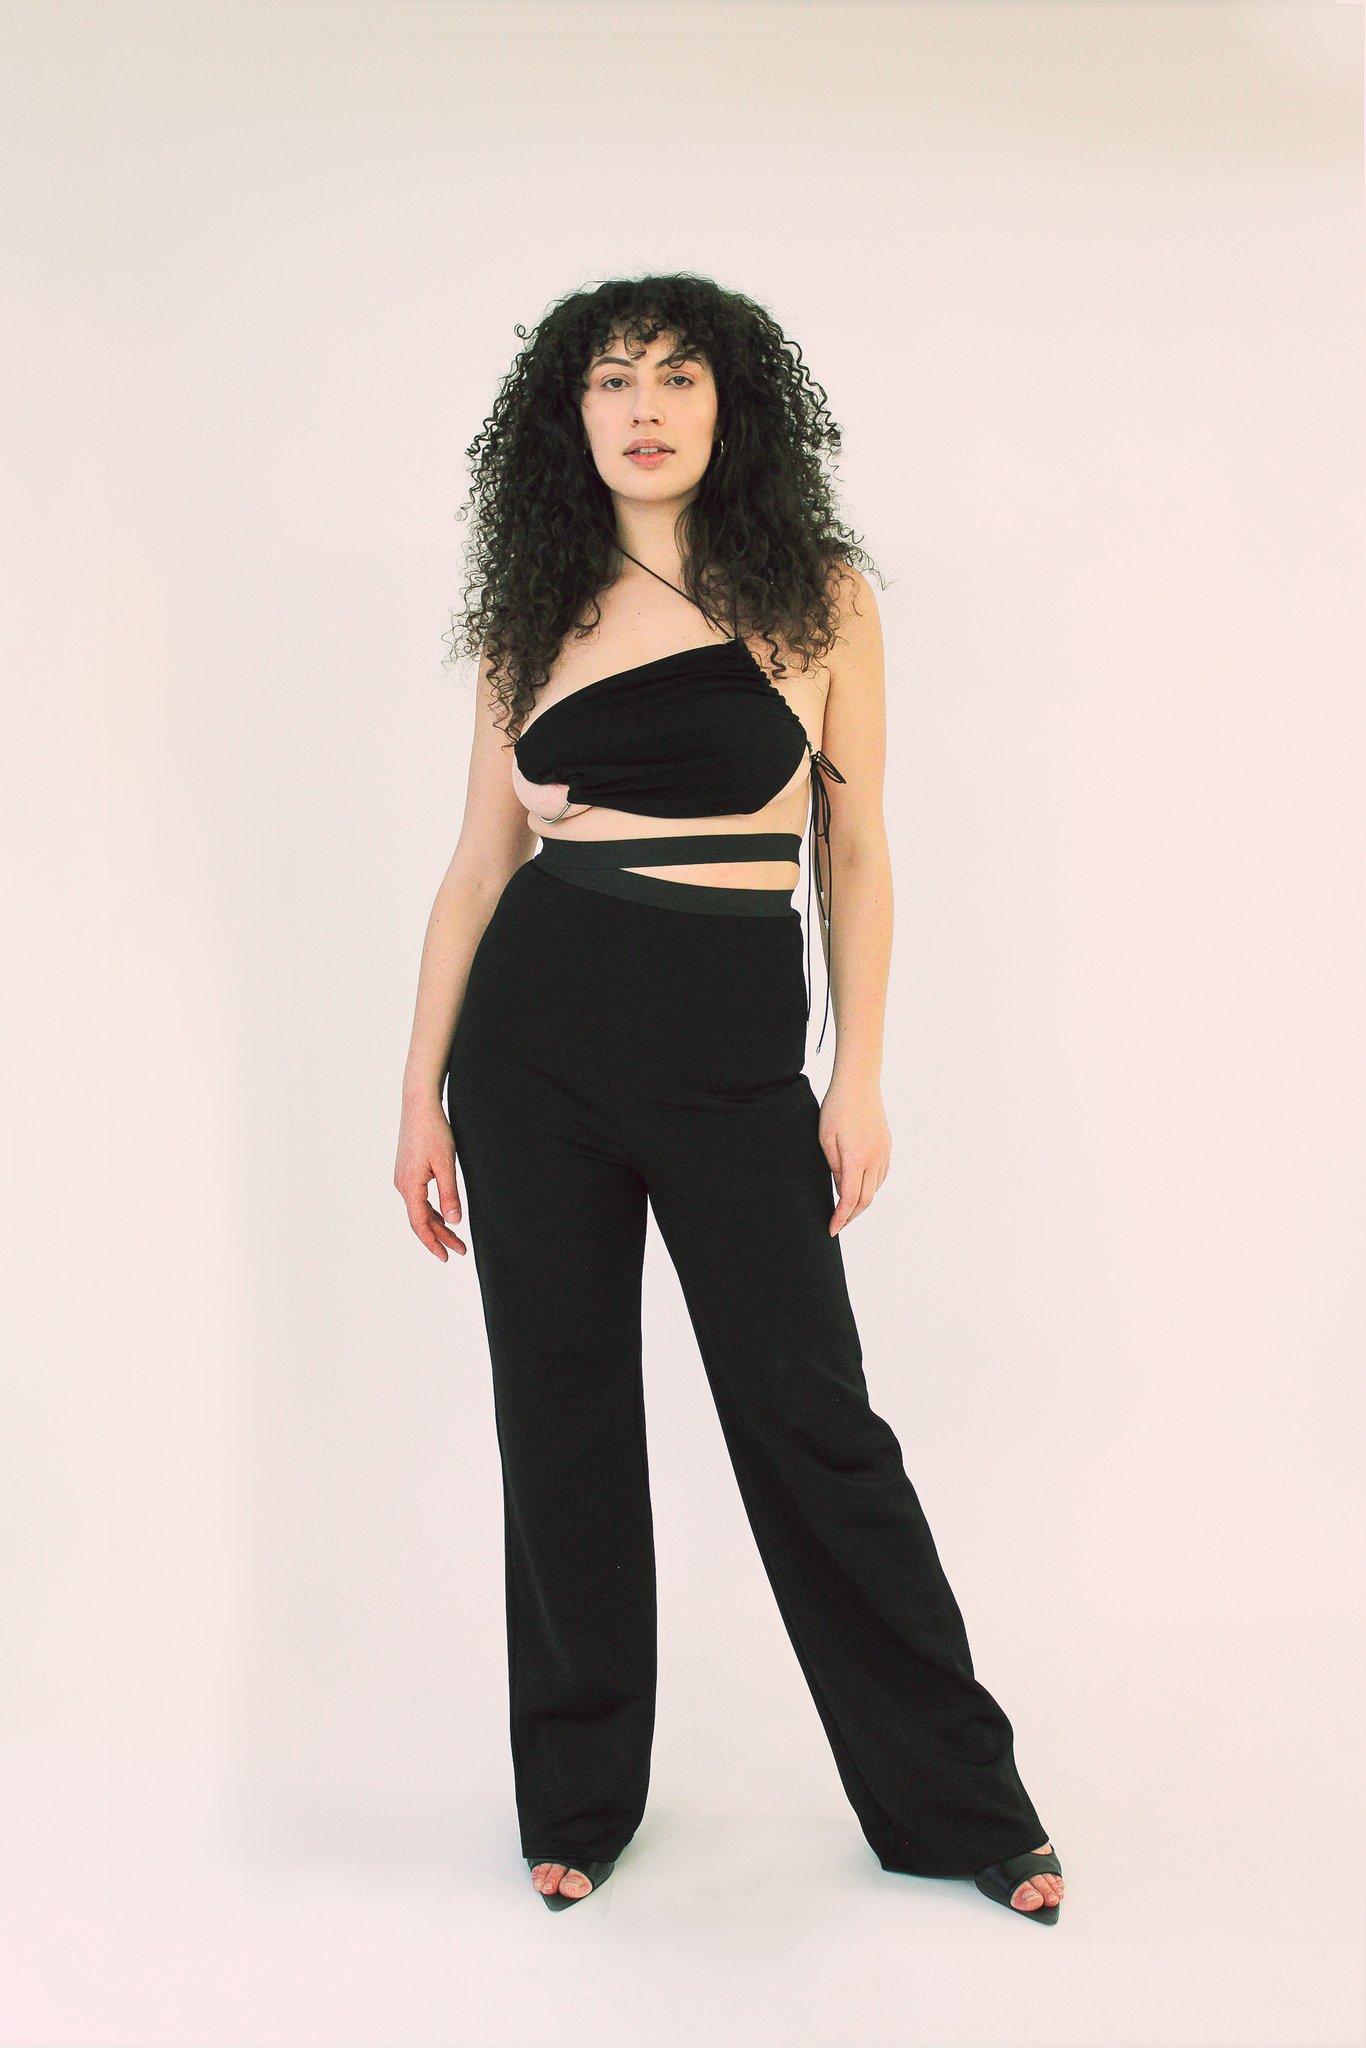 karoline vitto fashion designer brazilian curves folds rolls size inclusive showing off body positivity female body breathe